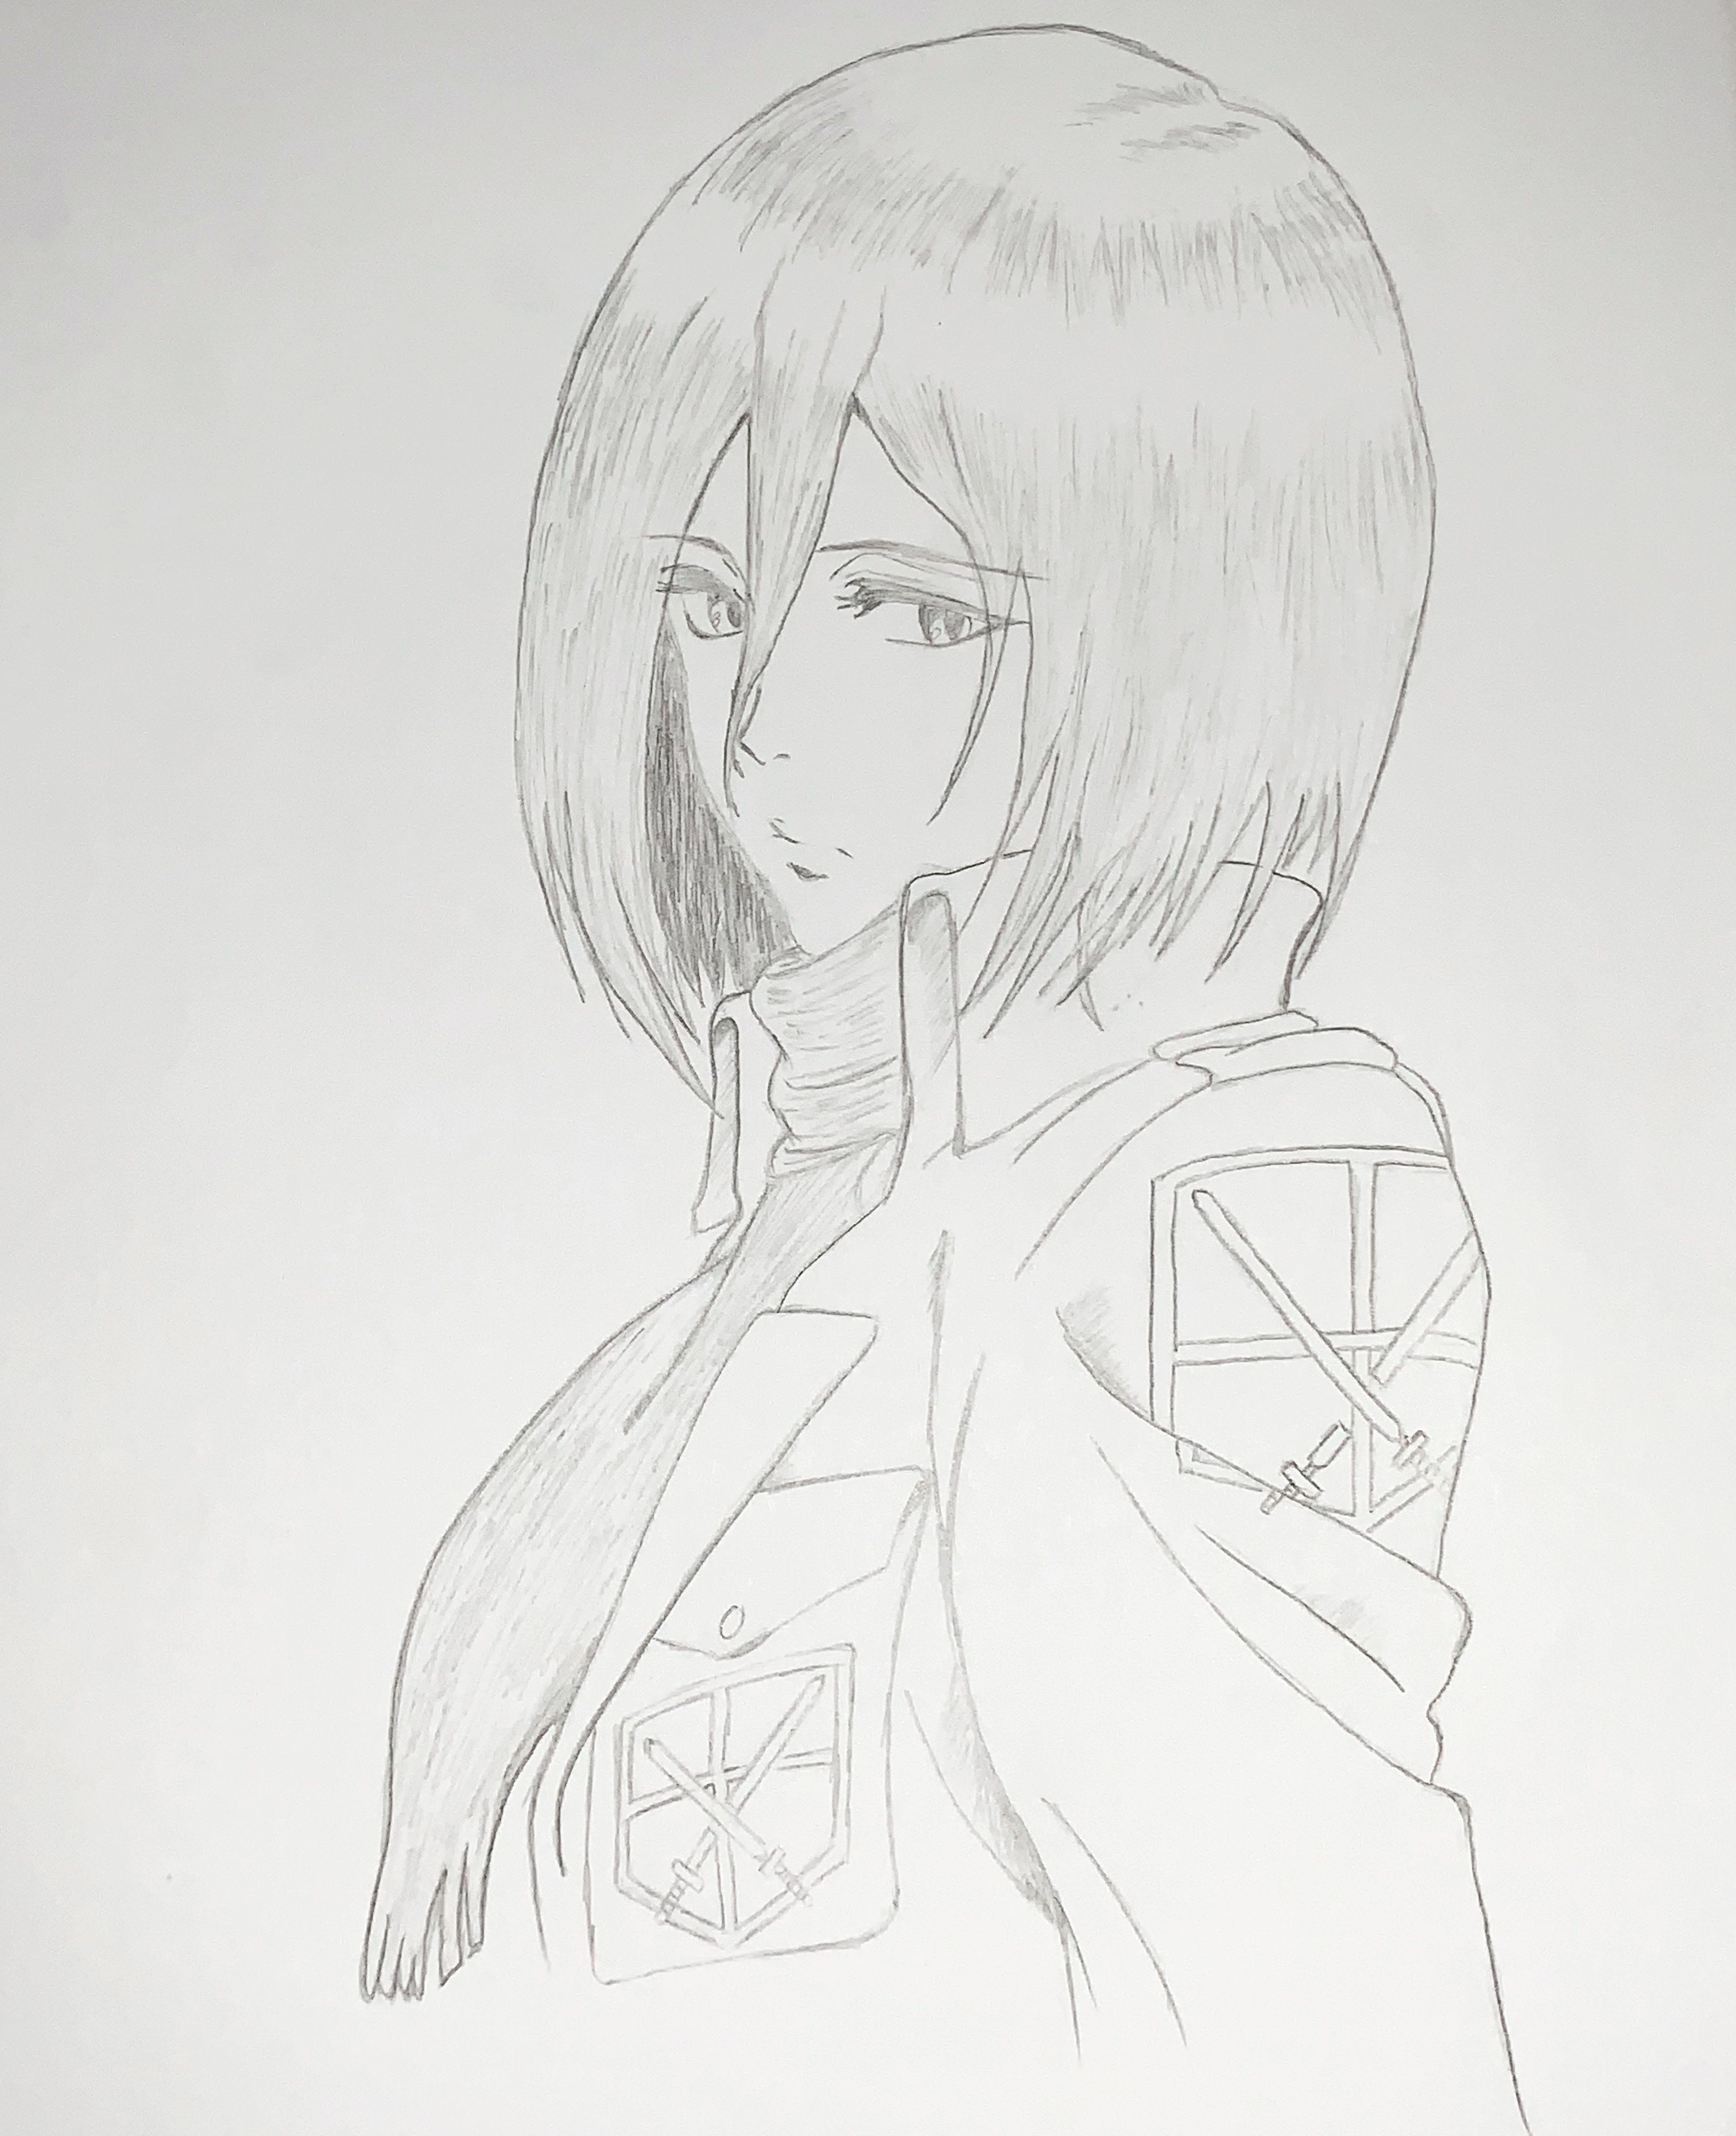 Mikasa Attack on Titan Anime drawing pencil Anime